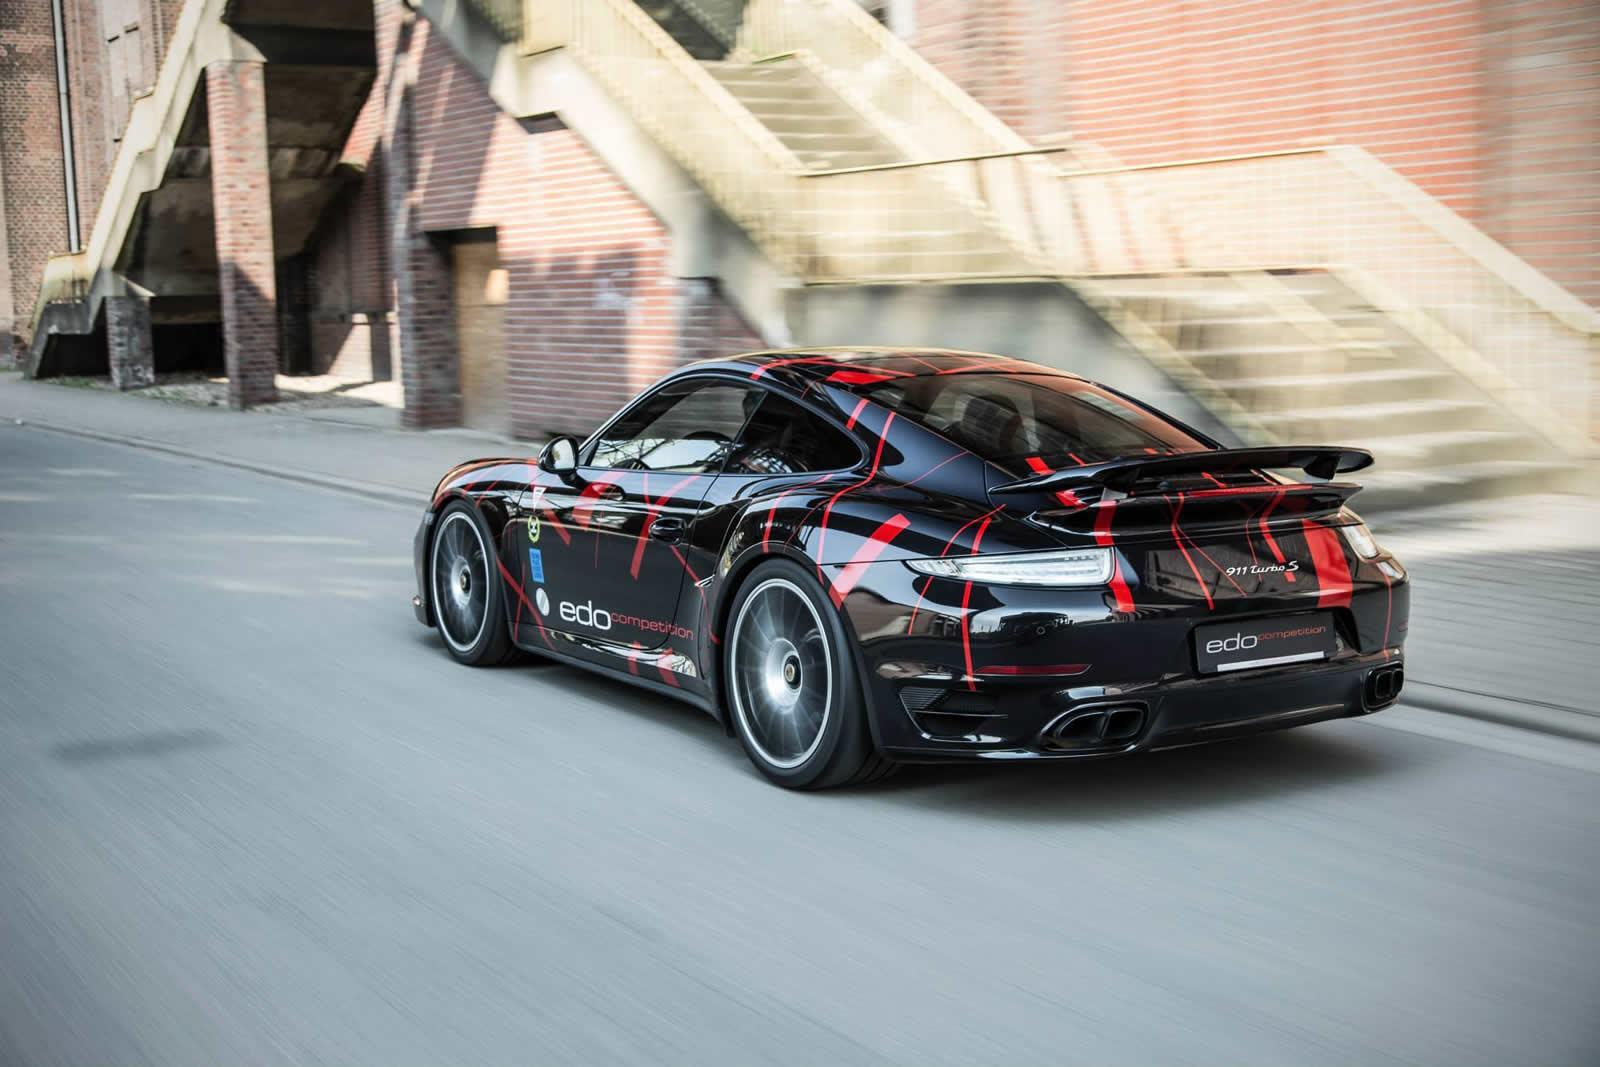 Foto de Edo Competition Porsche 911 Turbo S (7/15)